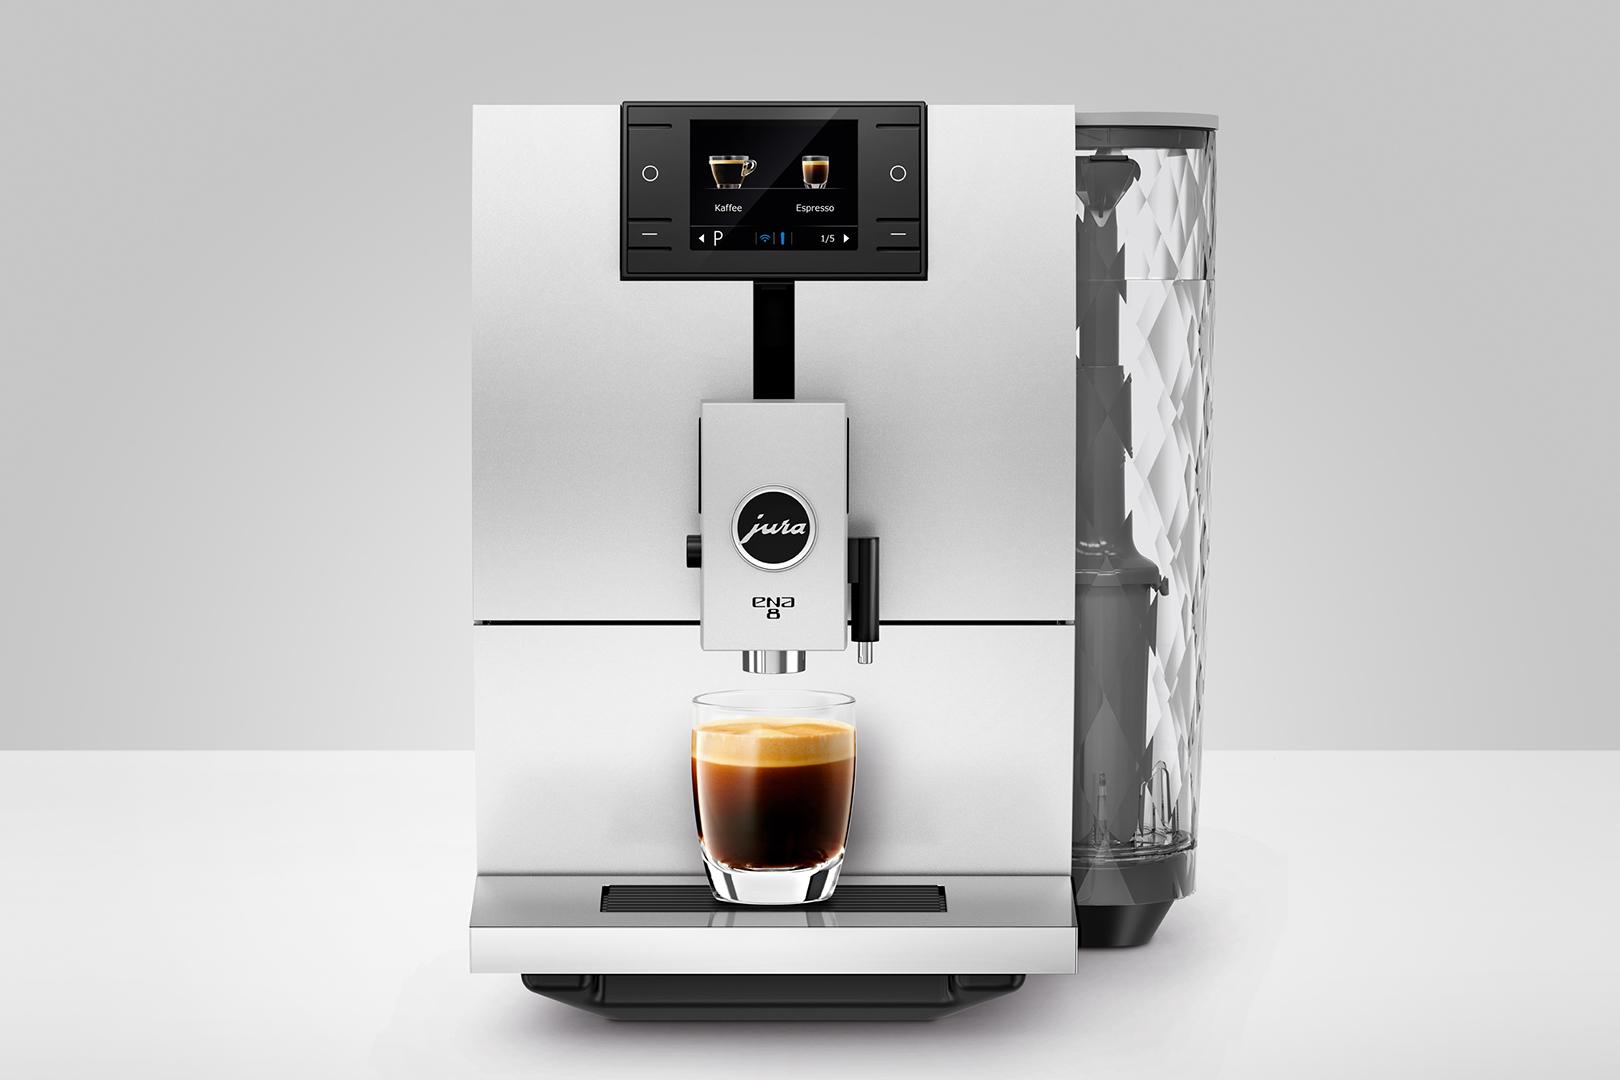 Кофемашина автоматическая Jura ENA 8 Nordic White